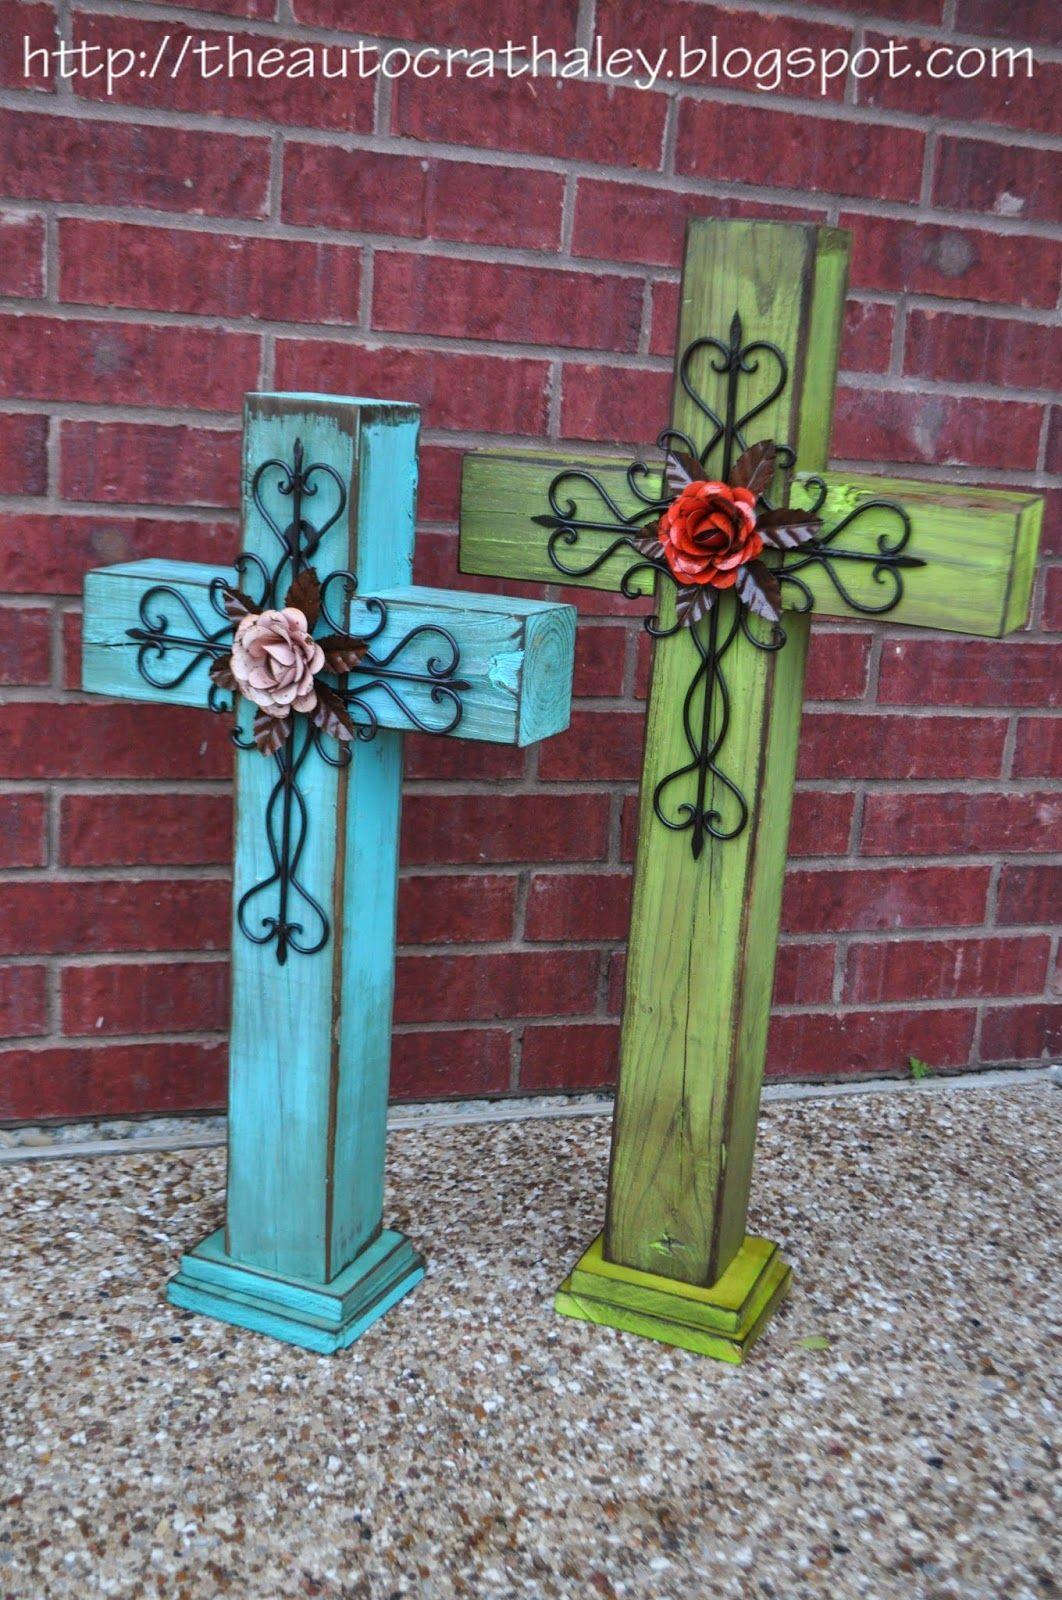 Besides cross clip art wall decor decorative wood cross decorative - The Autocrat Dyi Rustic Crosses Wood Crossesmosaic Crossespainted Crossescrosses Decorwall